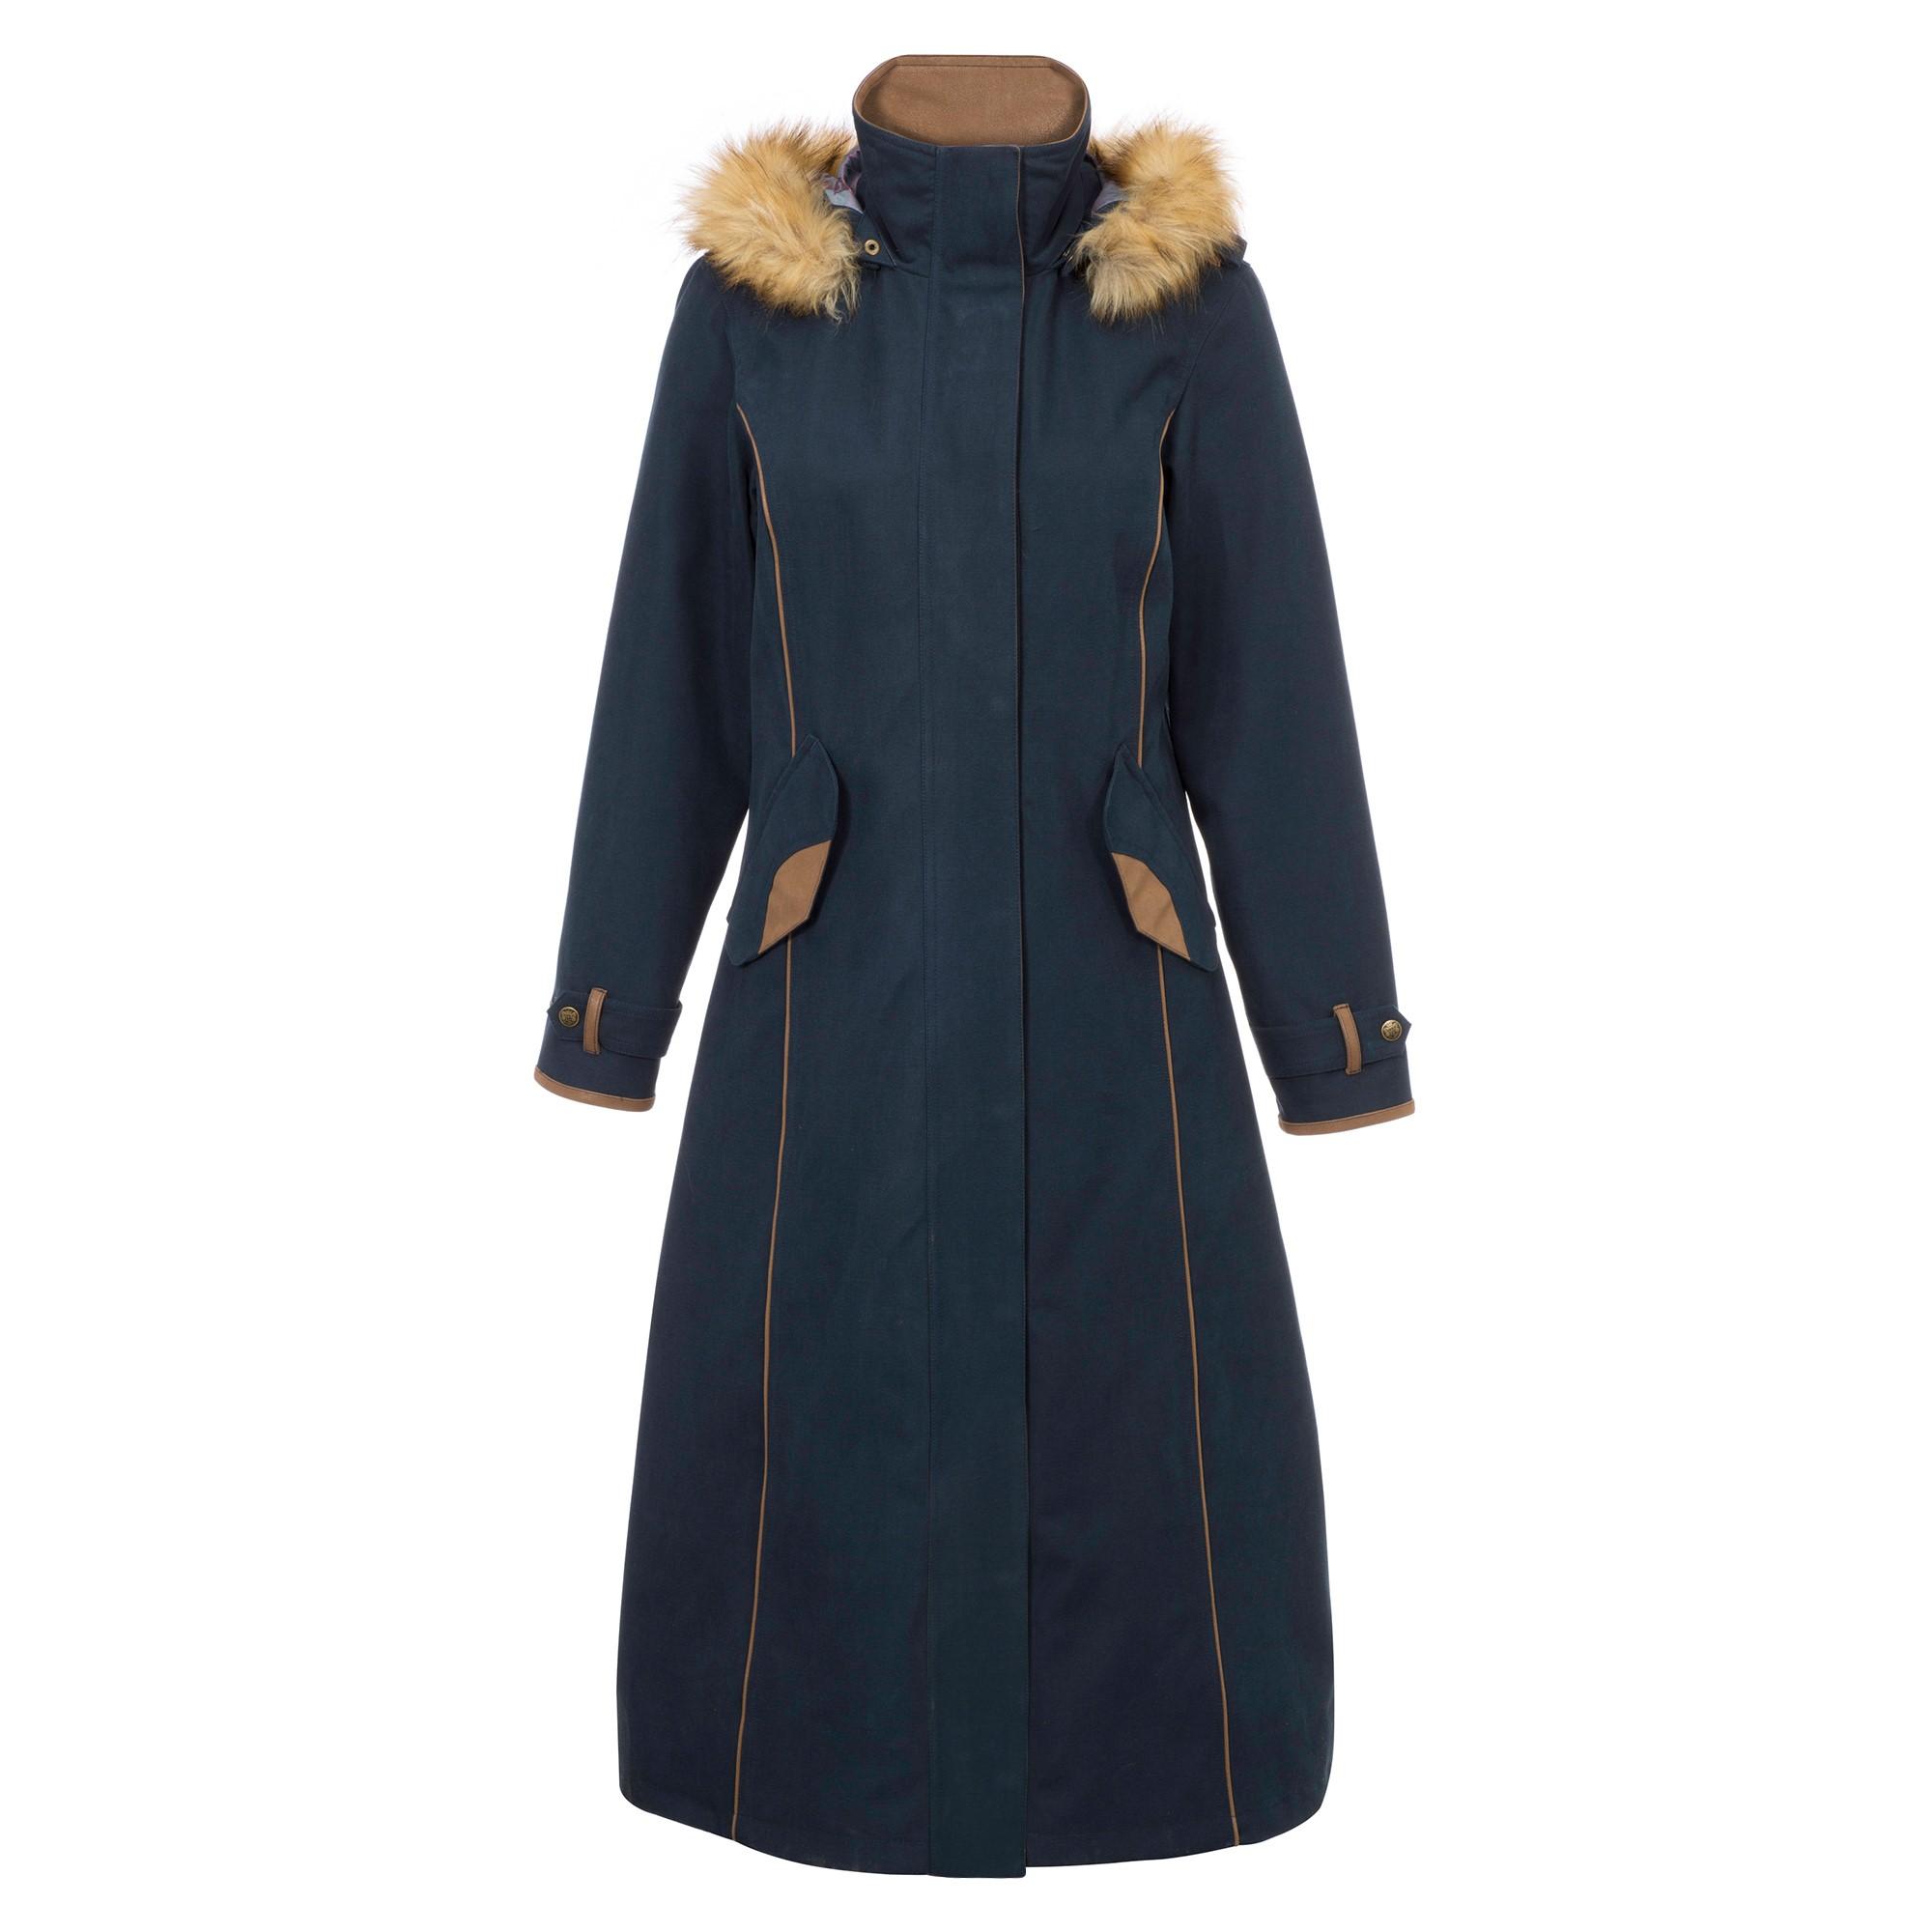 f327cfec0 Alan Paine Berwick Ladies Long Waterproof Coat – Navy or Brown – R ...